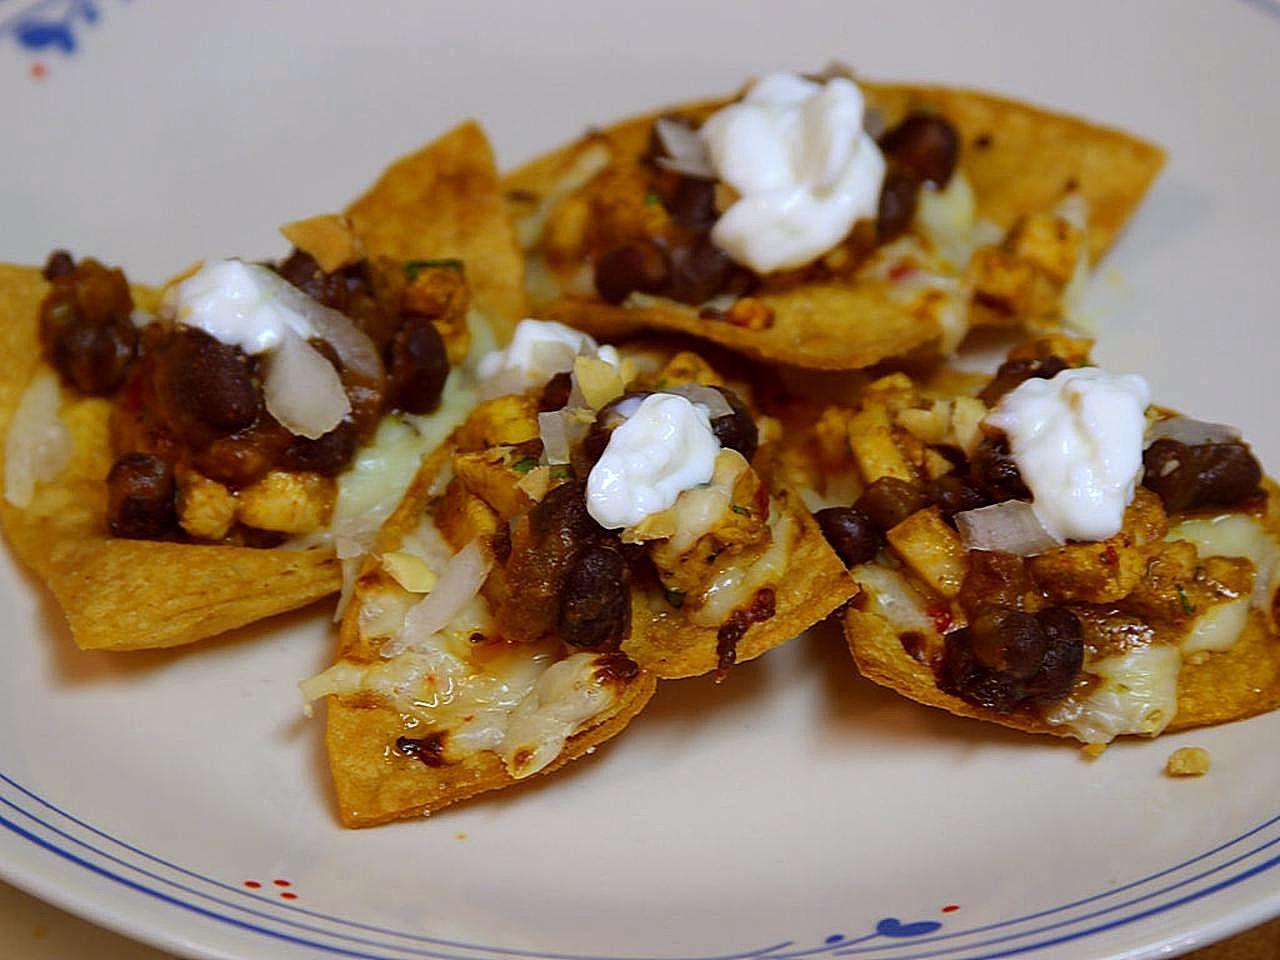 File:Chicken and black bean nachos food.jpg - Wikimedia Commons